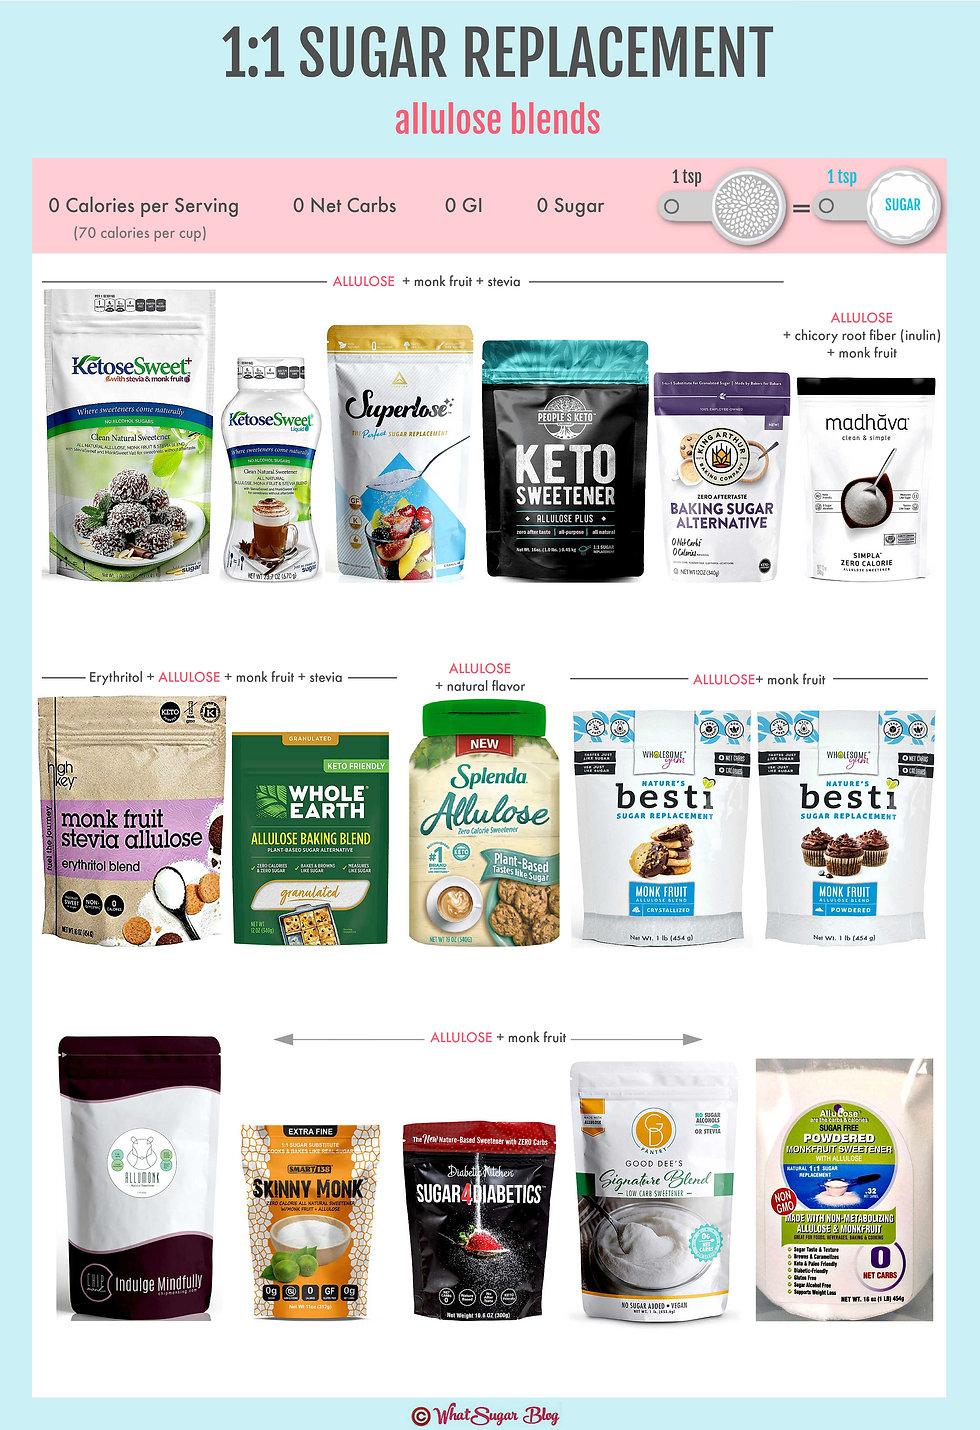 Brands of Allulose 1:1 Sugar Replacement